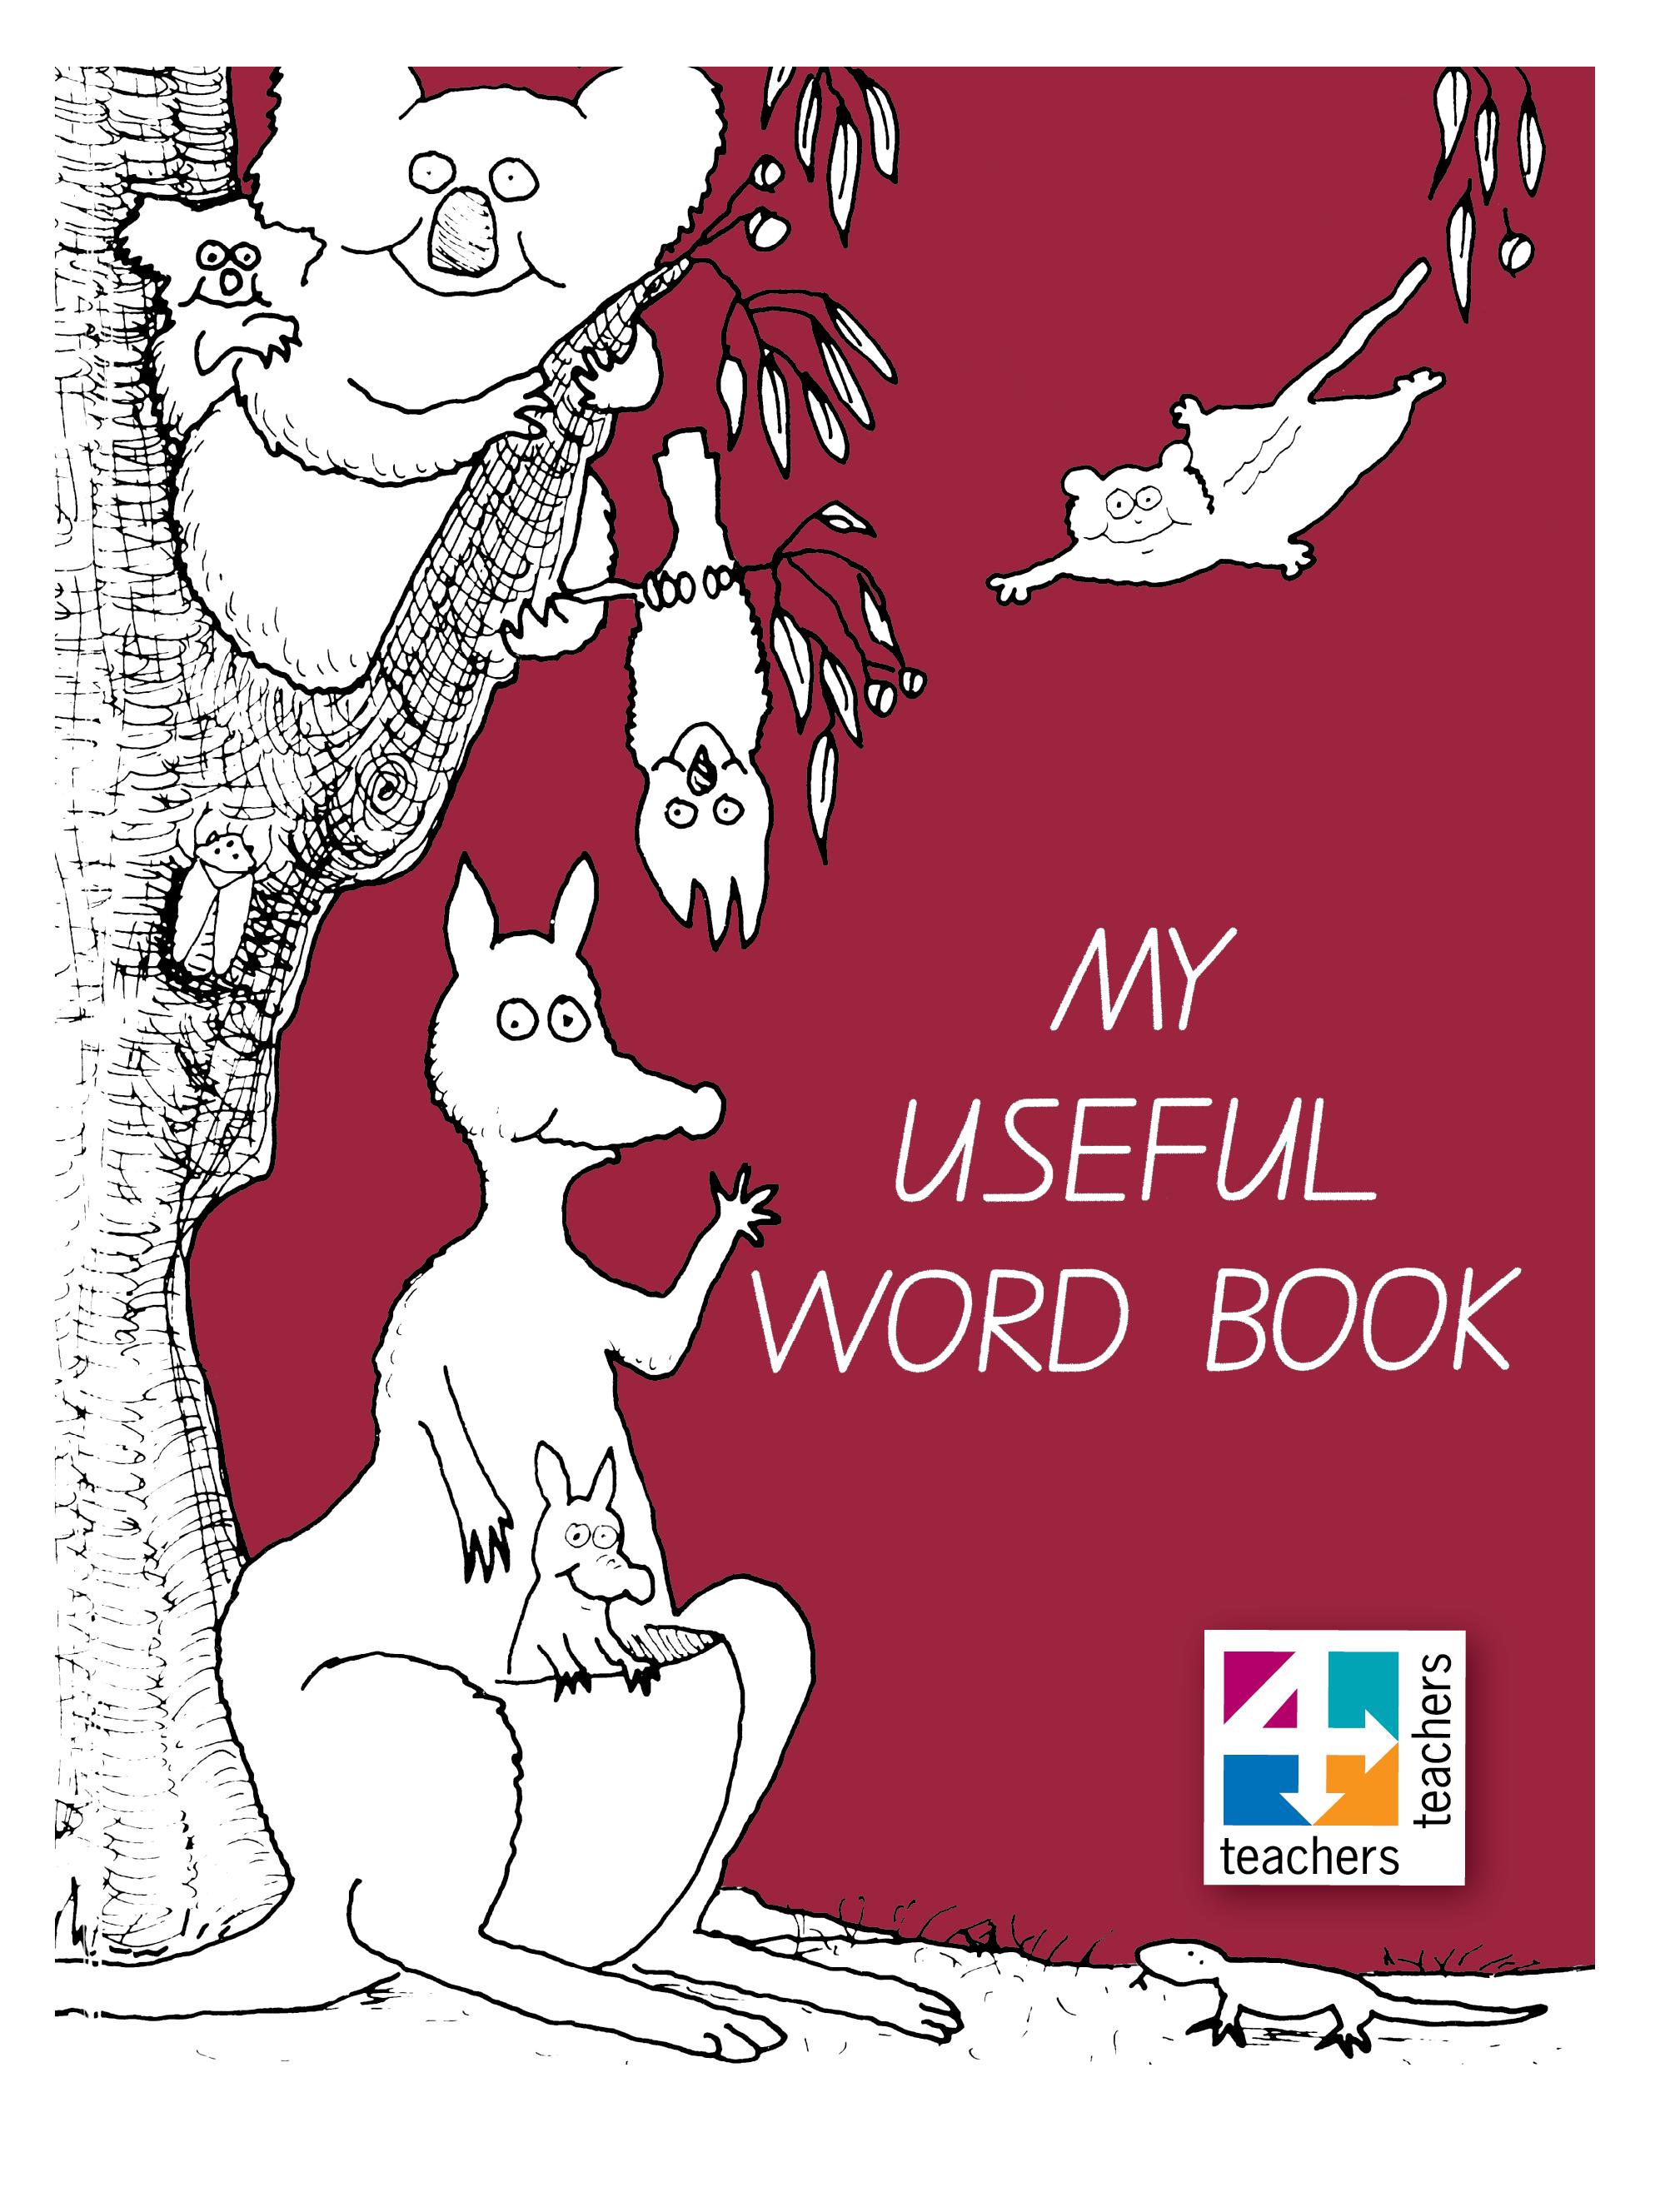 usefulbooks-02.png